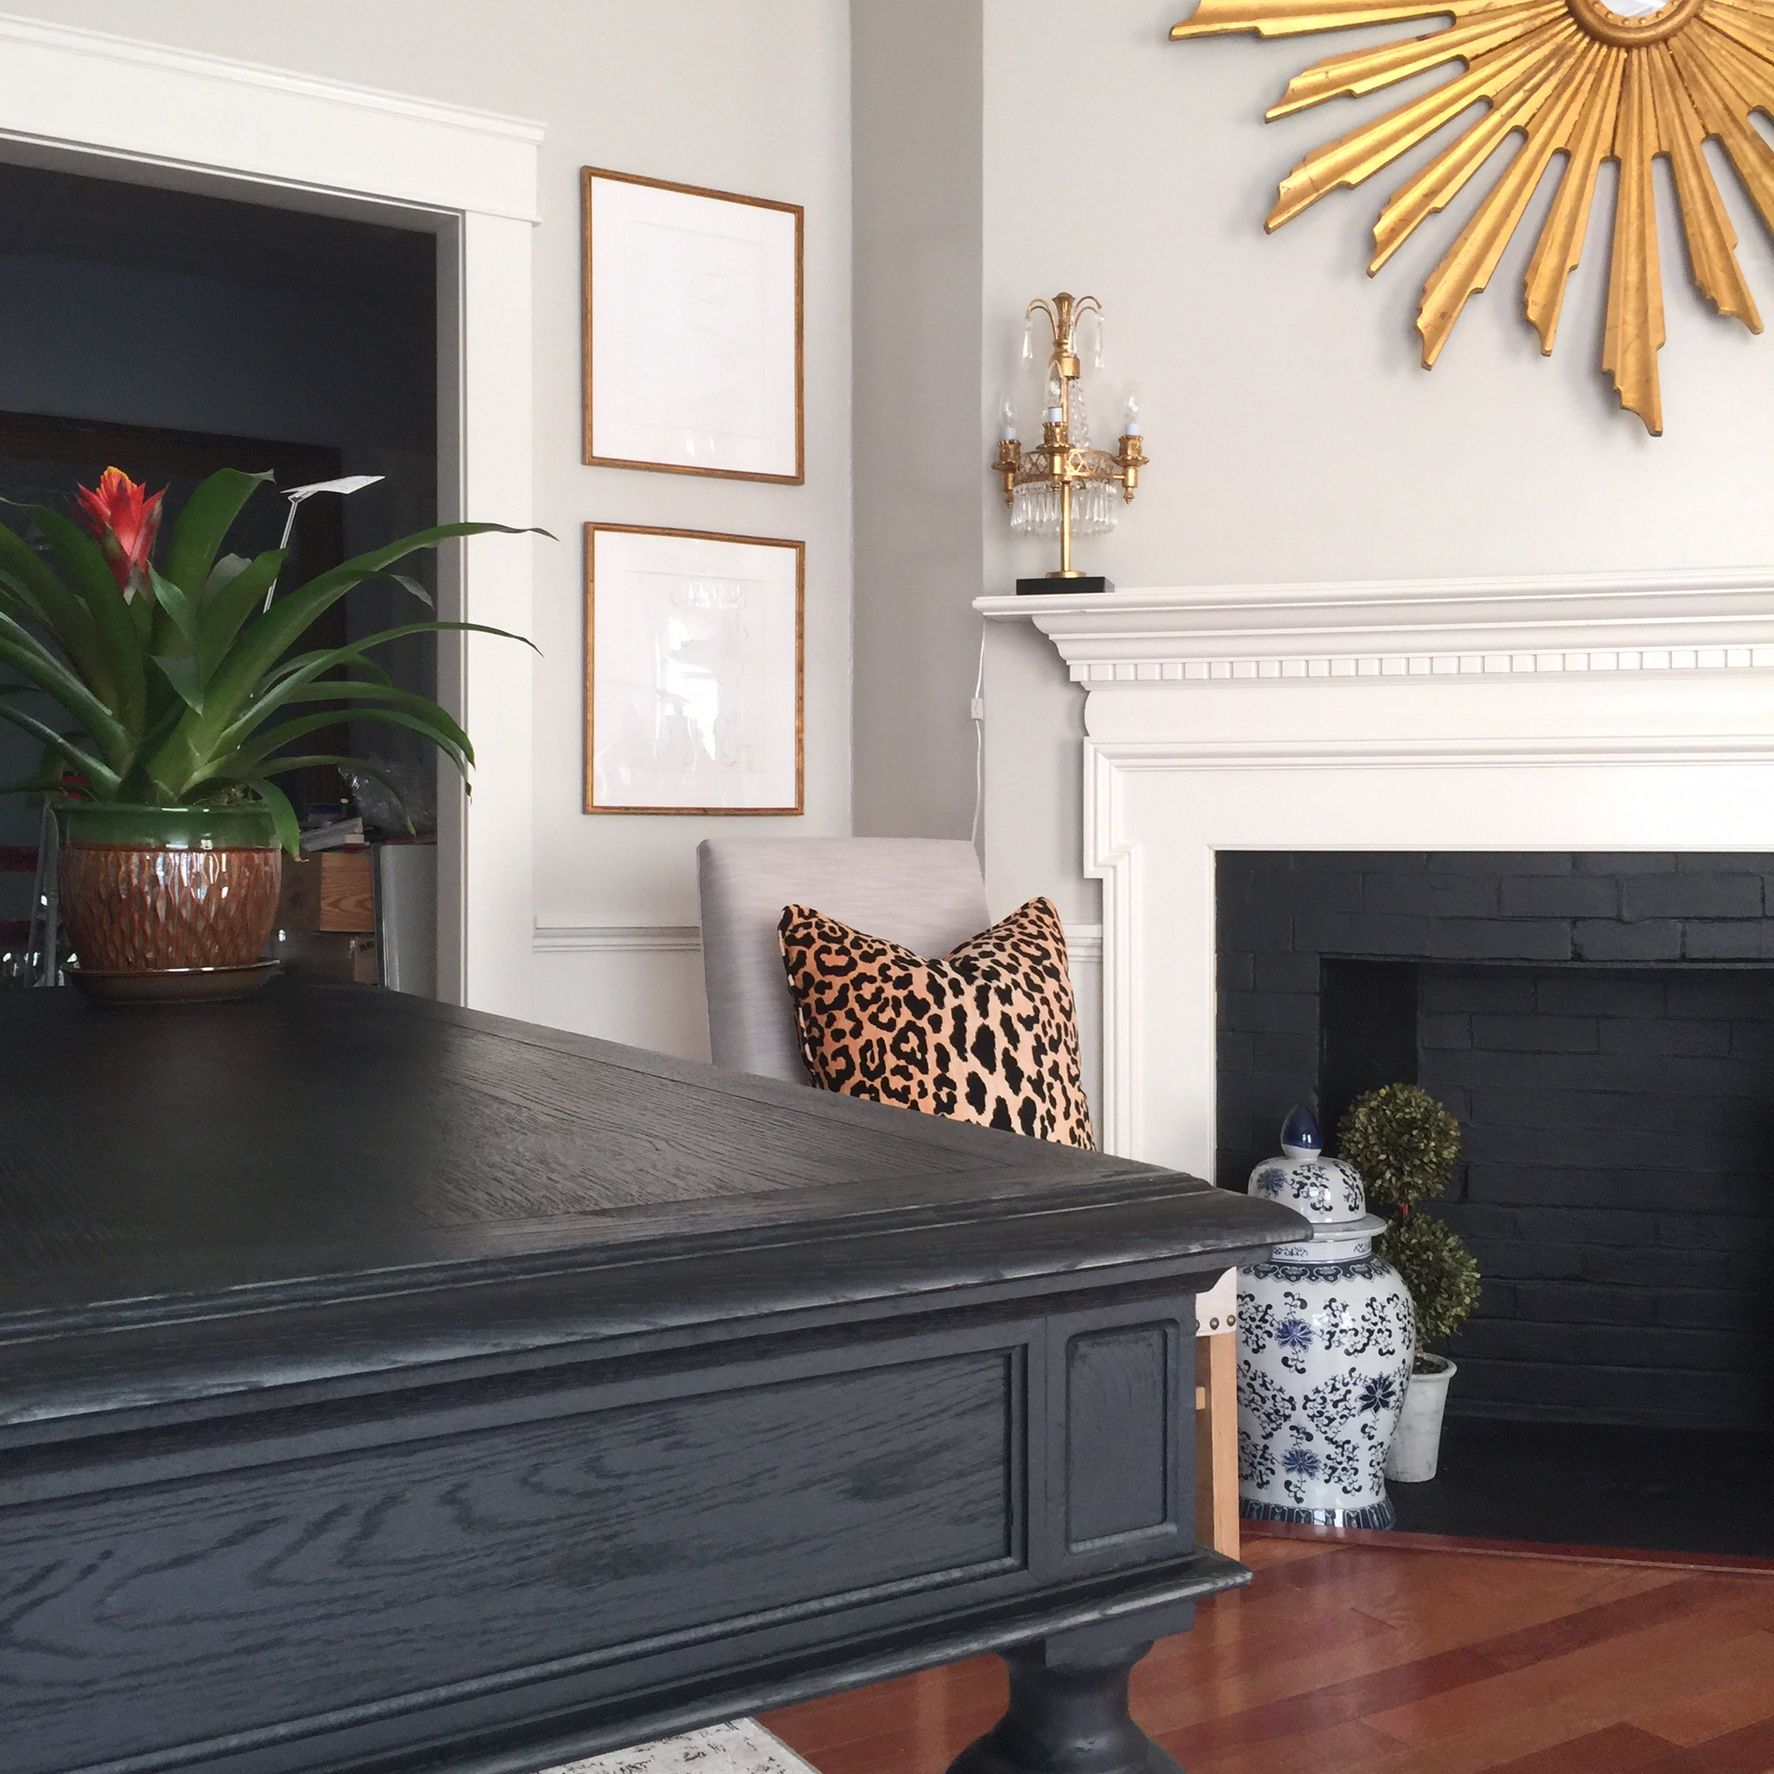 Pin by Jeff B on Job | Home decor, Home, Decor